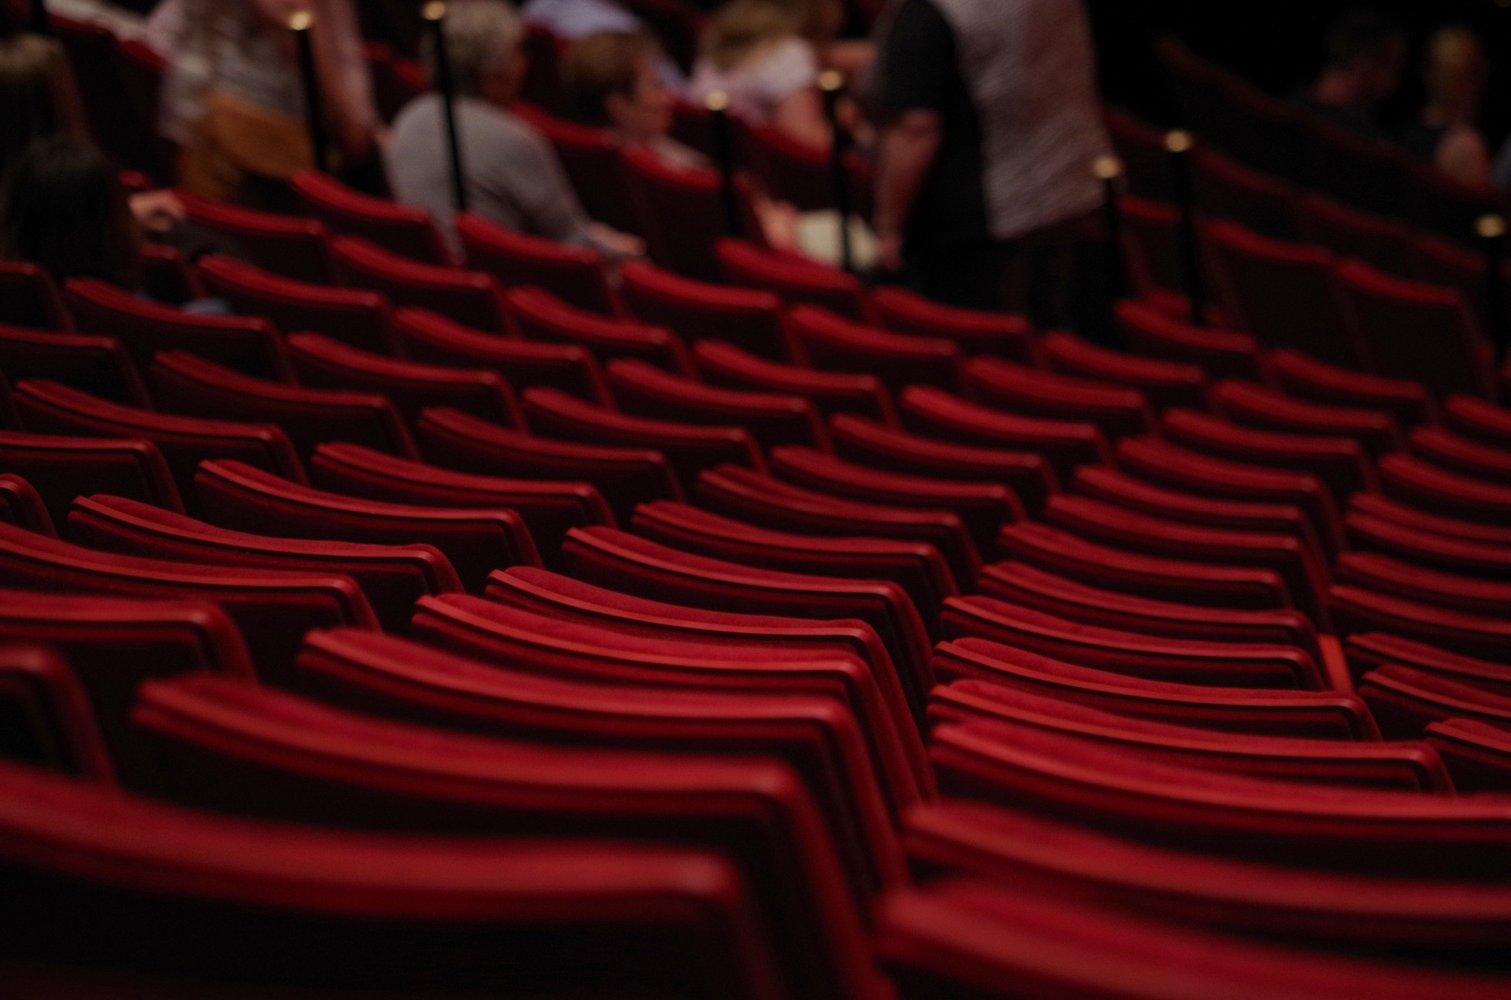 theater-1477670_1920